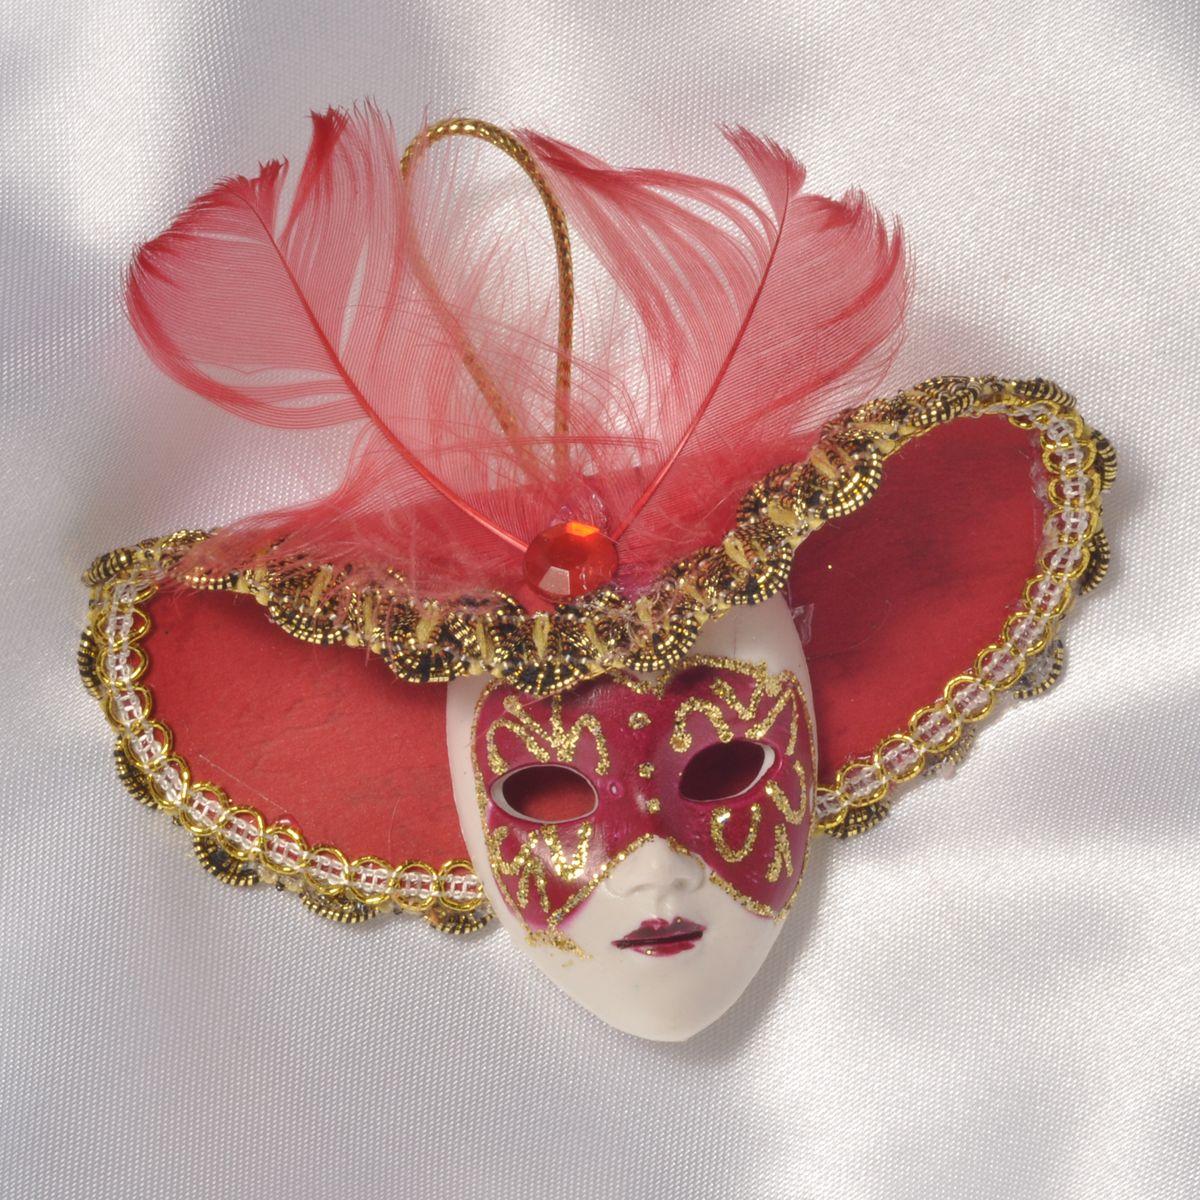 Masquerade Wedding Favors Chocolate Prom Favors -Masquerade Theme ...